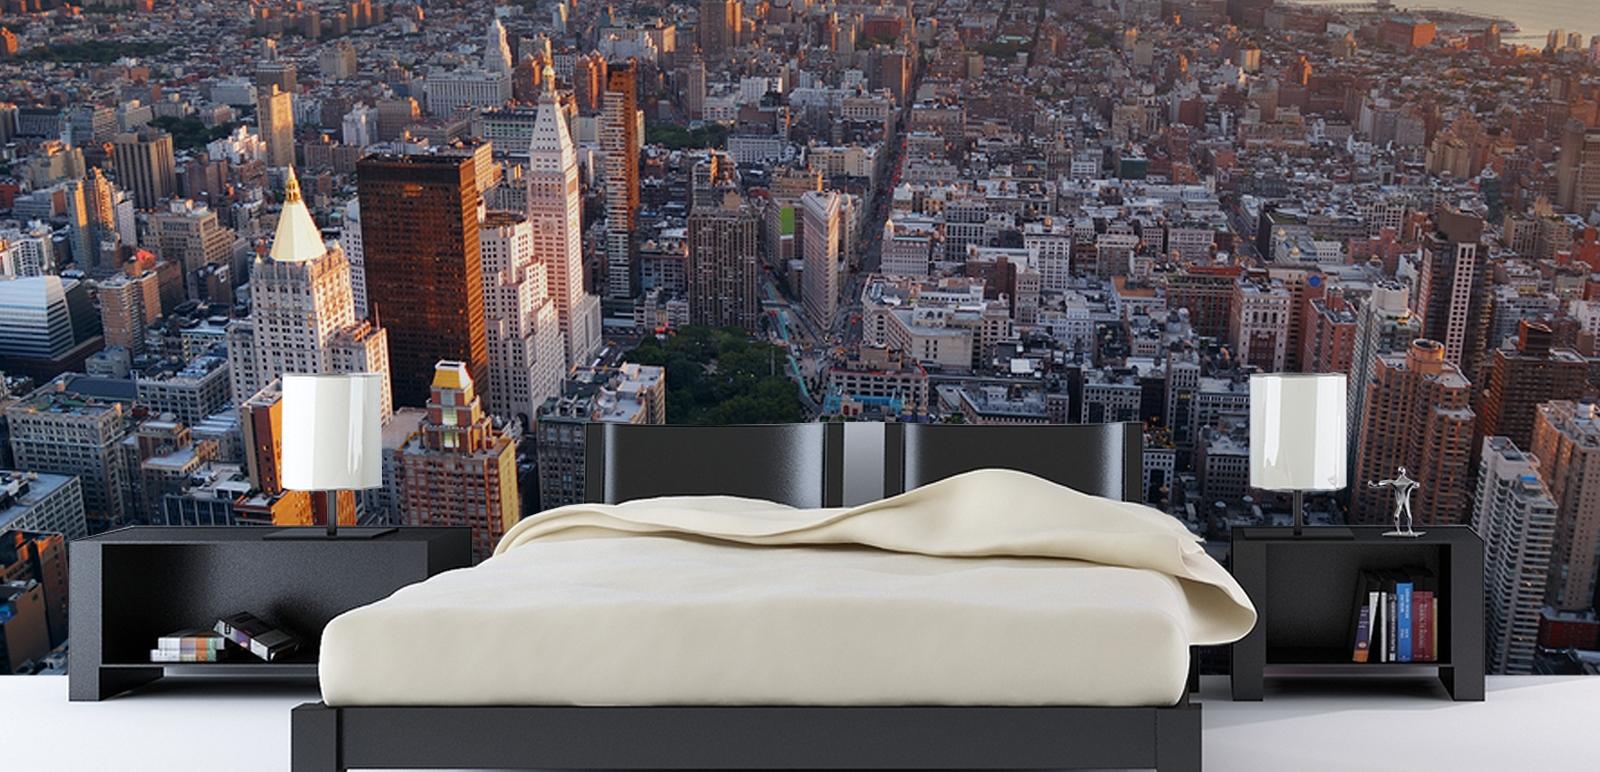 New York City Wallpaper For Bedroom City Wallpaper Bedroom Hd Wallpaper